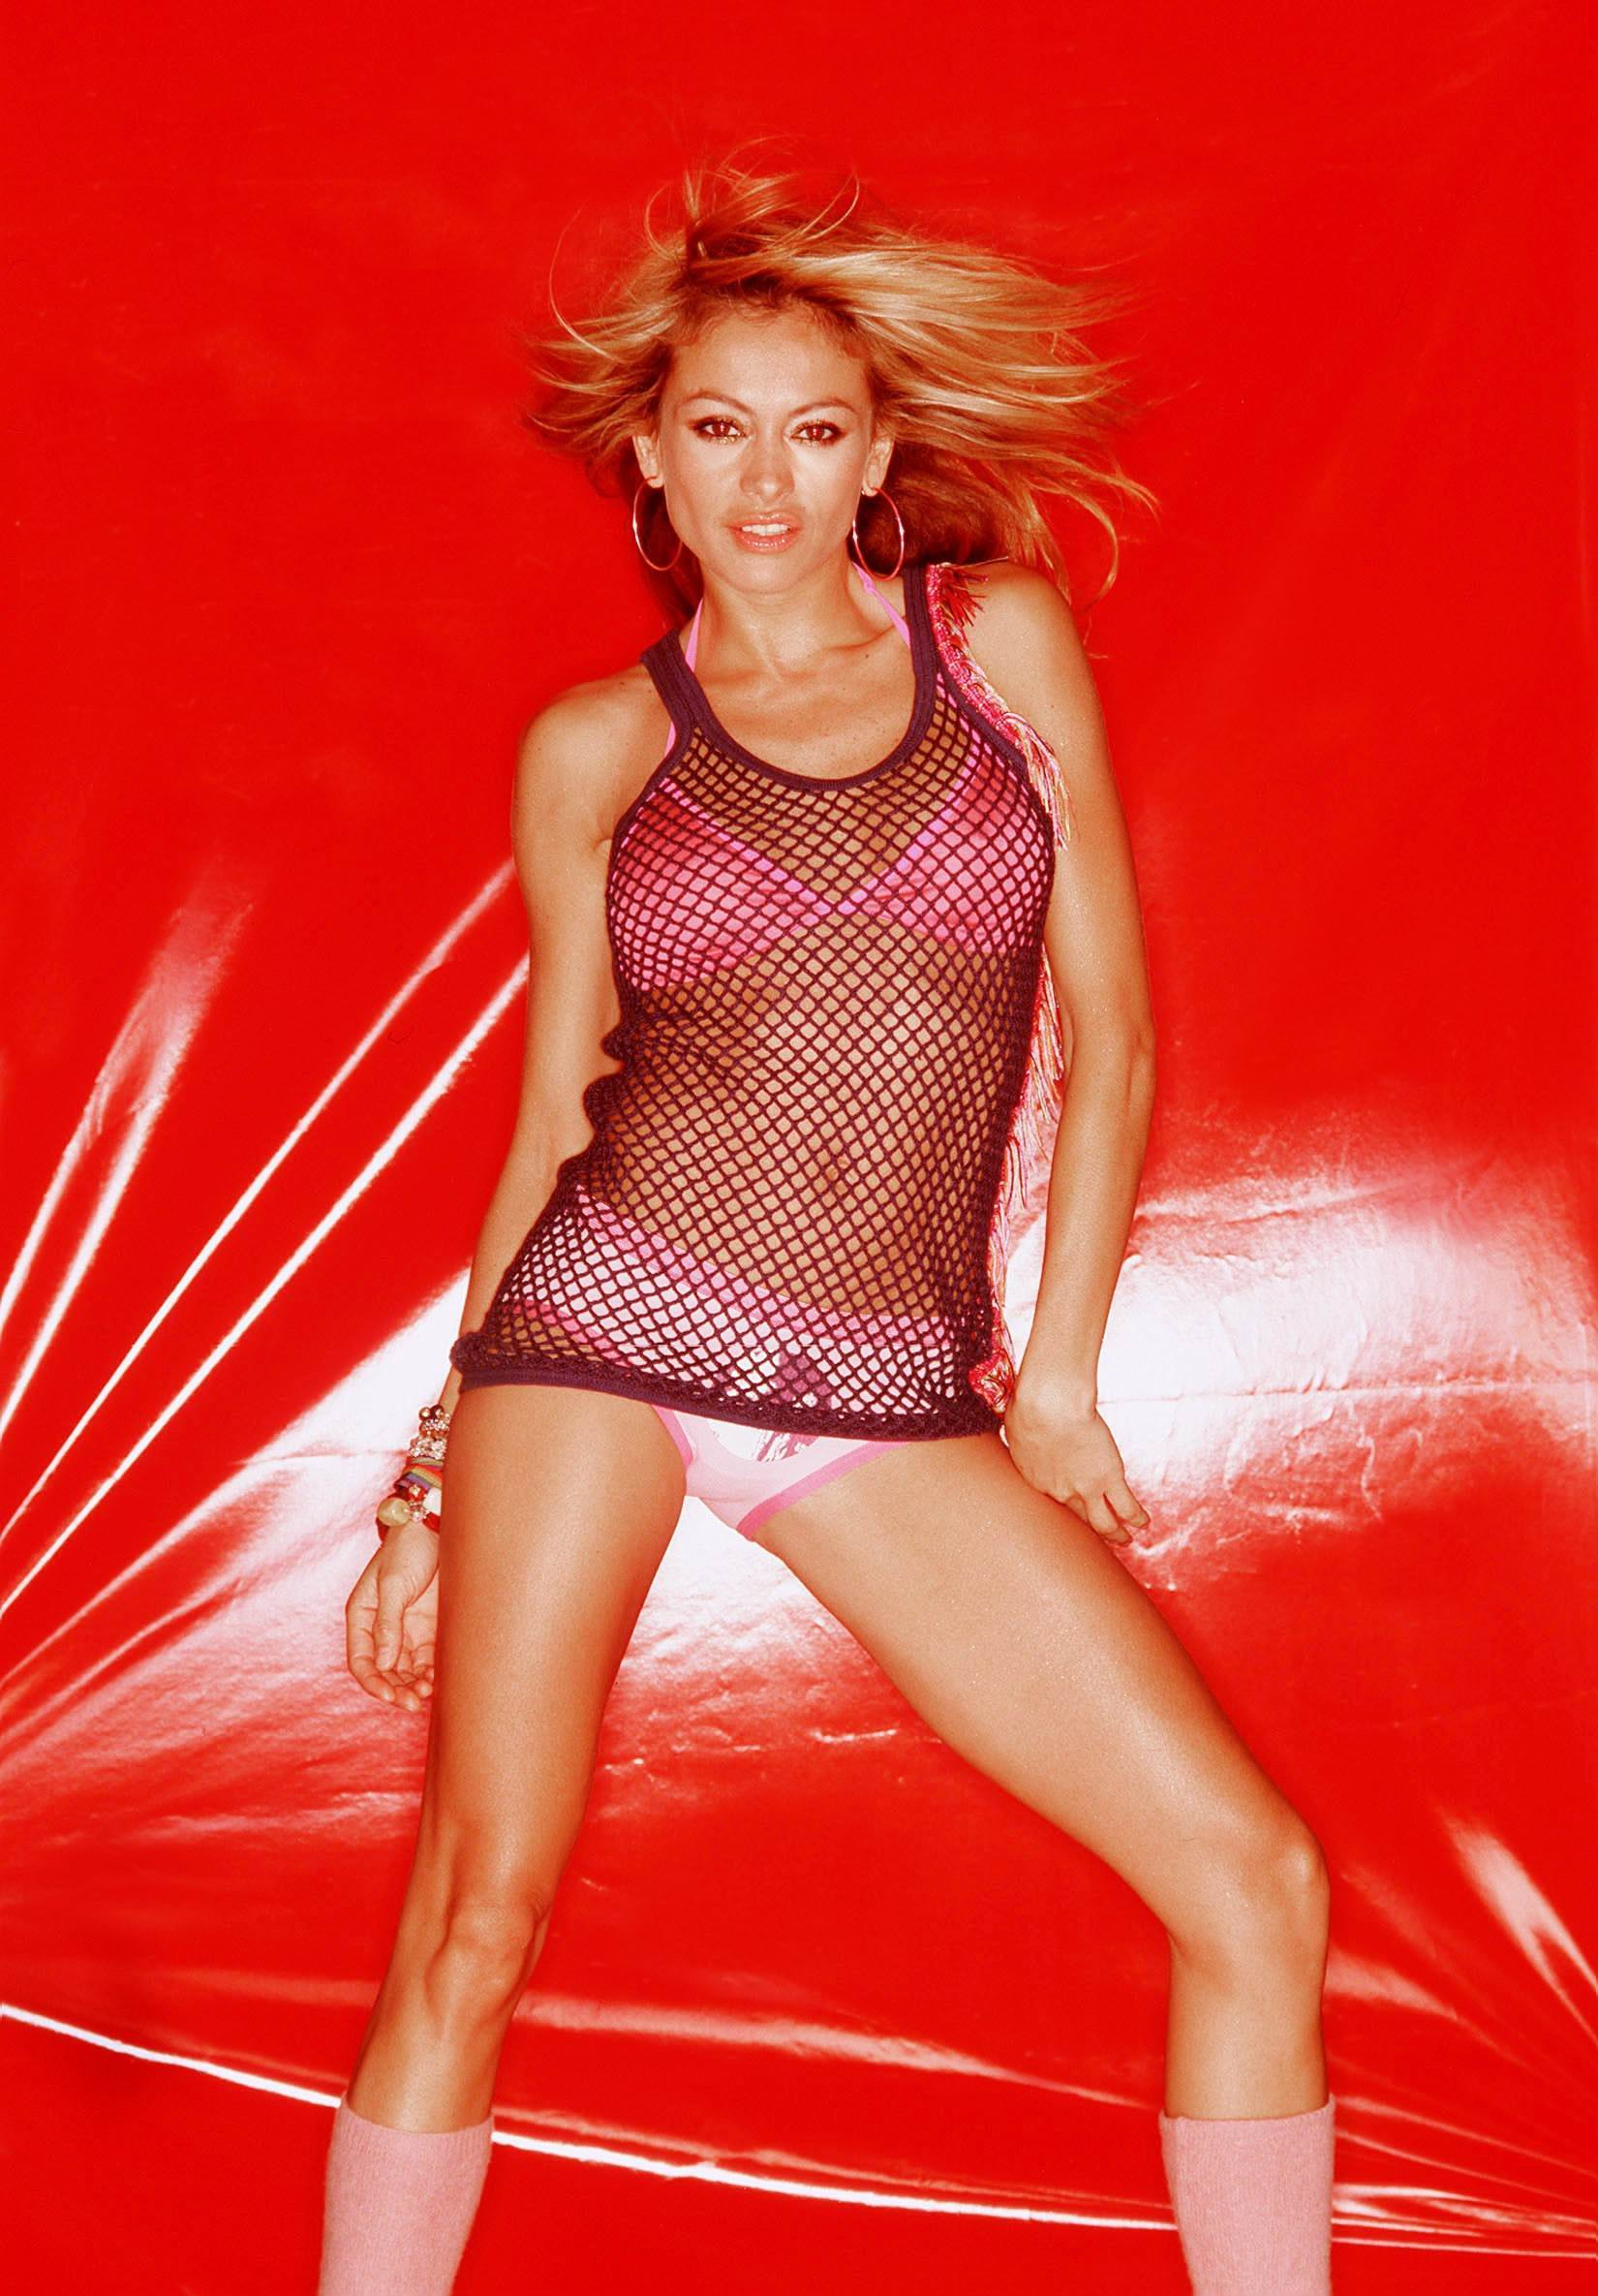 Paulina rubio hot naked and nude #2